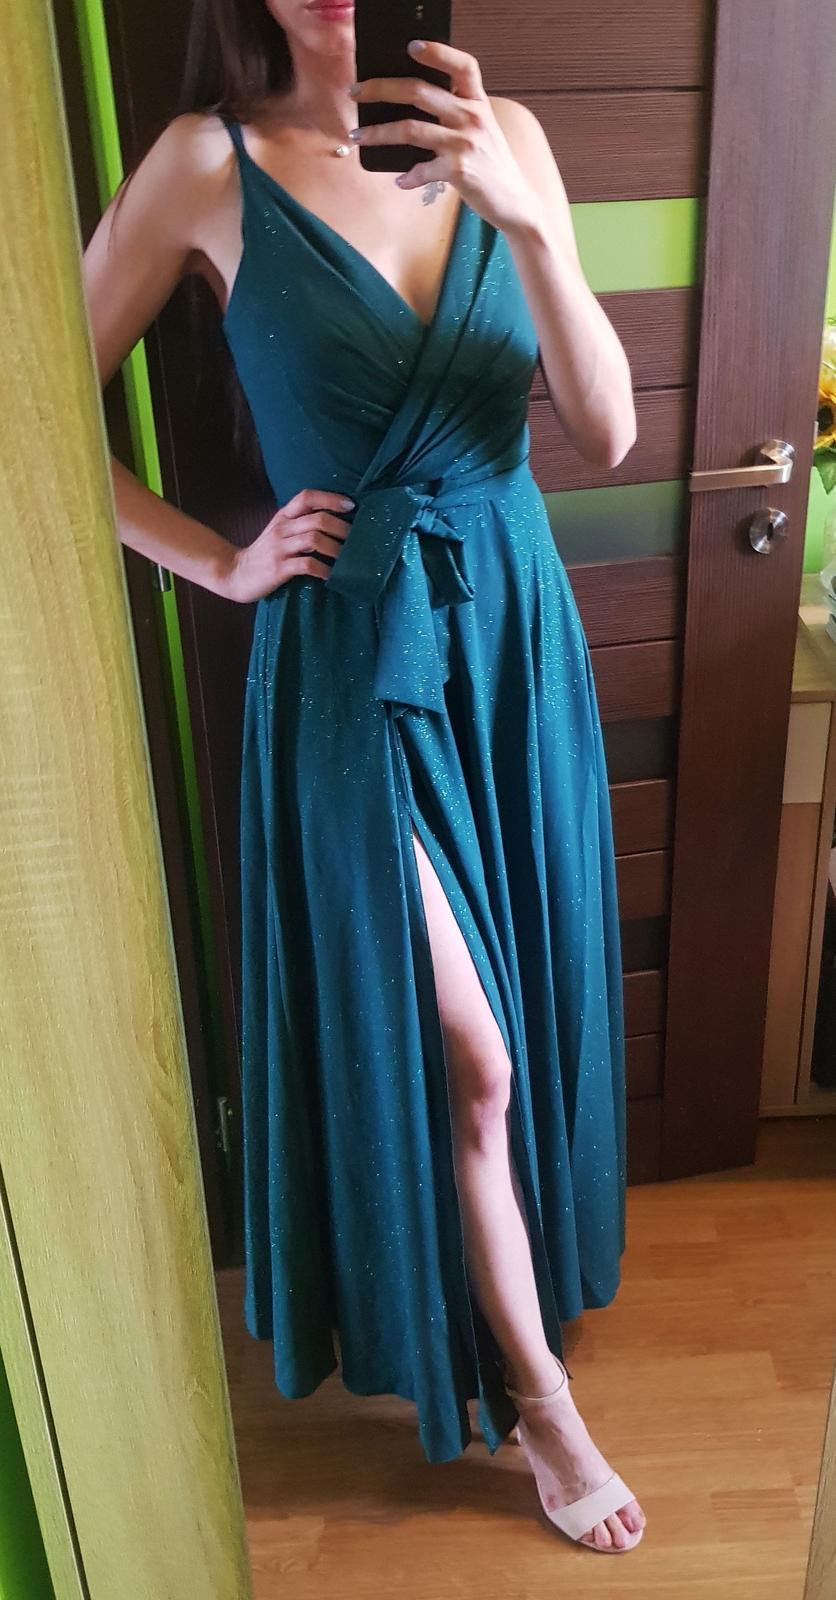 Trblietavé spoločenské šaty XS- tmavozelené - Obrázok č. 1